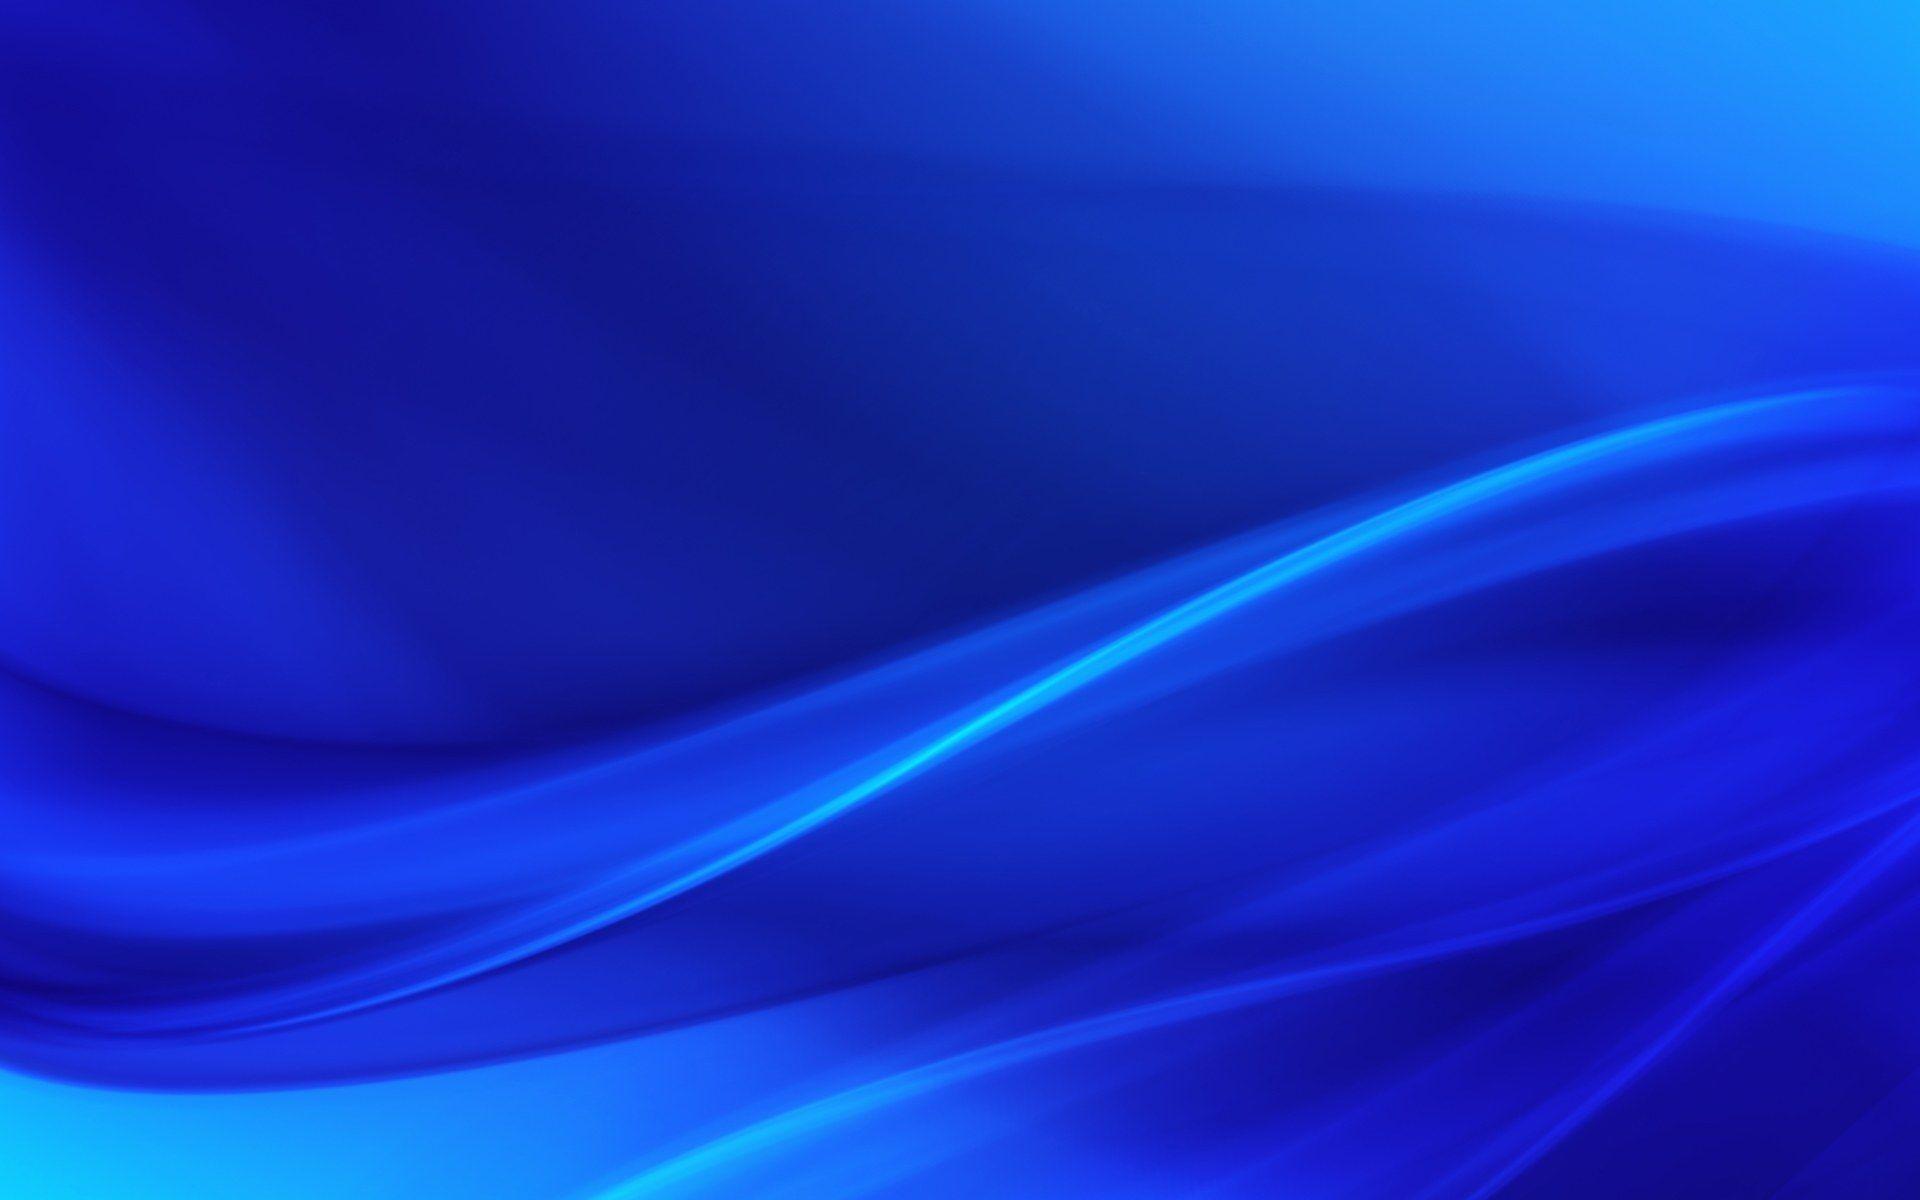 hinh nen mau xanh 37